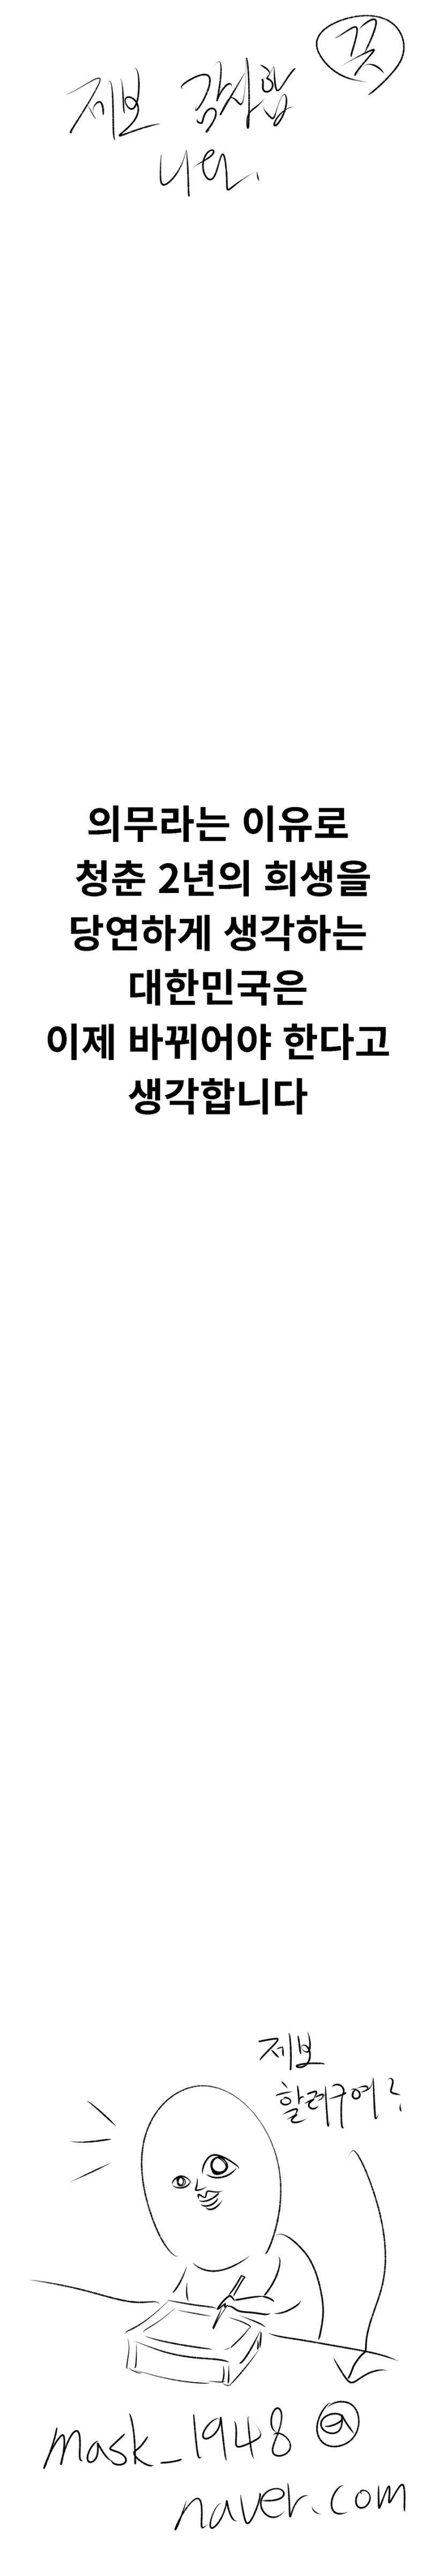 viewimage.php?id=2ebcc232eadd36&no=24b0d769e1d32ca73fec80fa11d028319511fc2d4825bdd78ebab3202c4e0554b8759a1dbd96debaf51336cab16bf5992a74c2acb9ea244ffef3f830ebf53b78ffbe7899810958297e1d0e613184051359336550dcc84a6013830154a179f30e8033e8a026bf6819